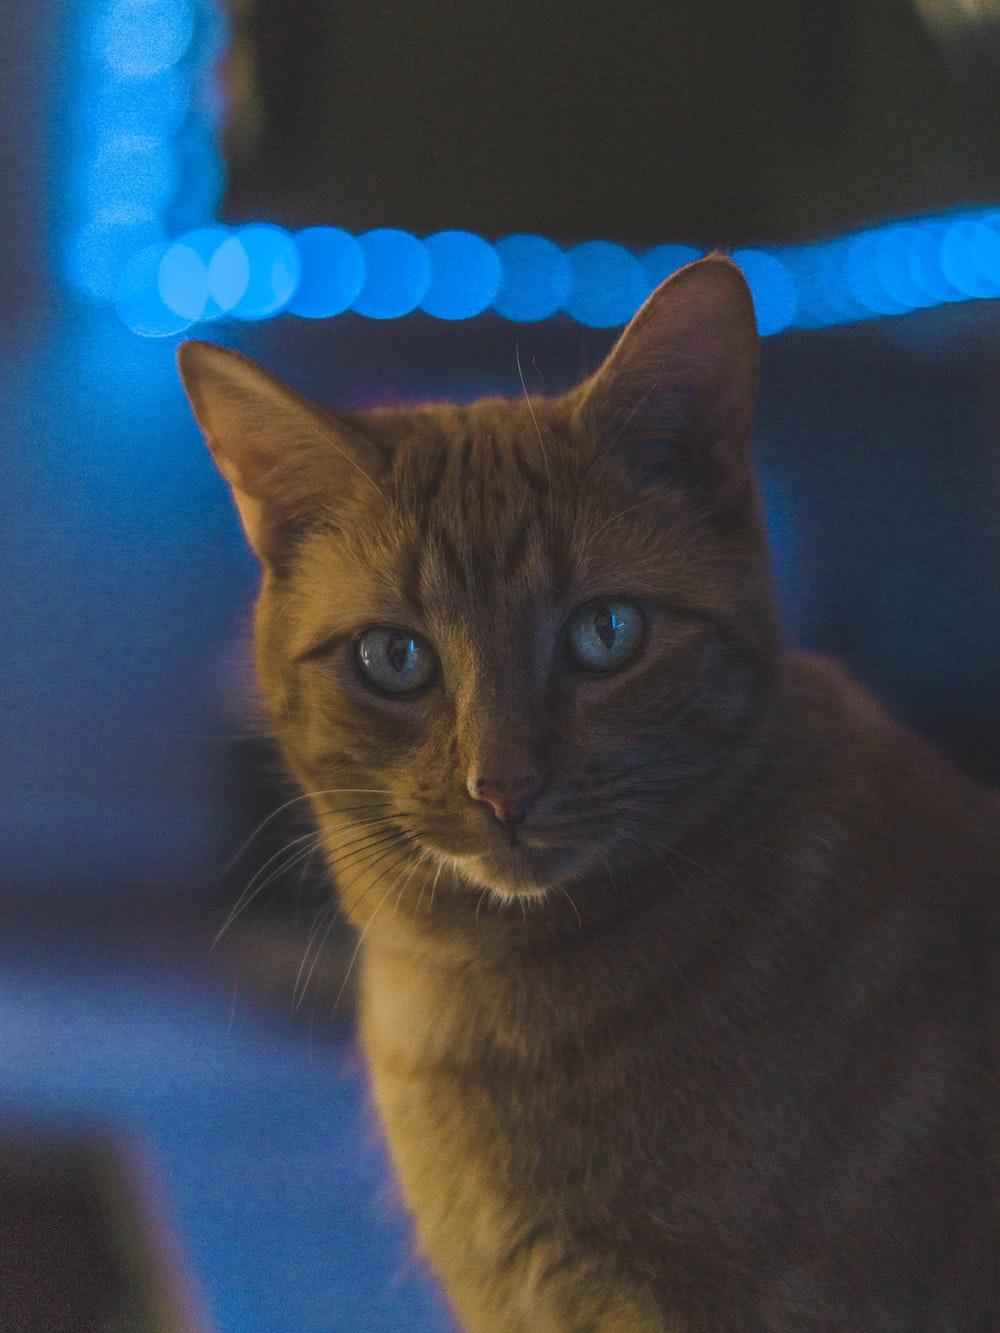 bokeh photography of orange tabby cat